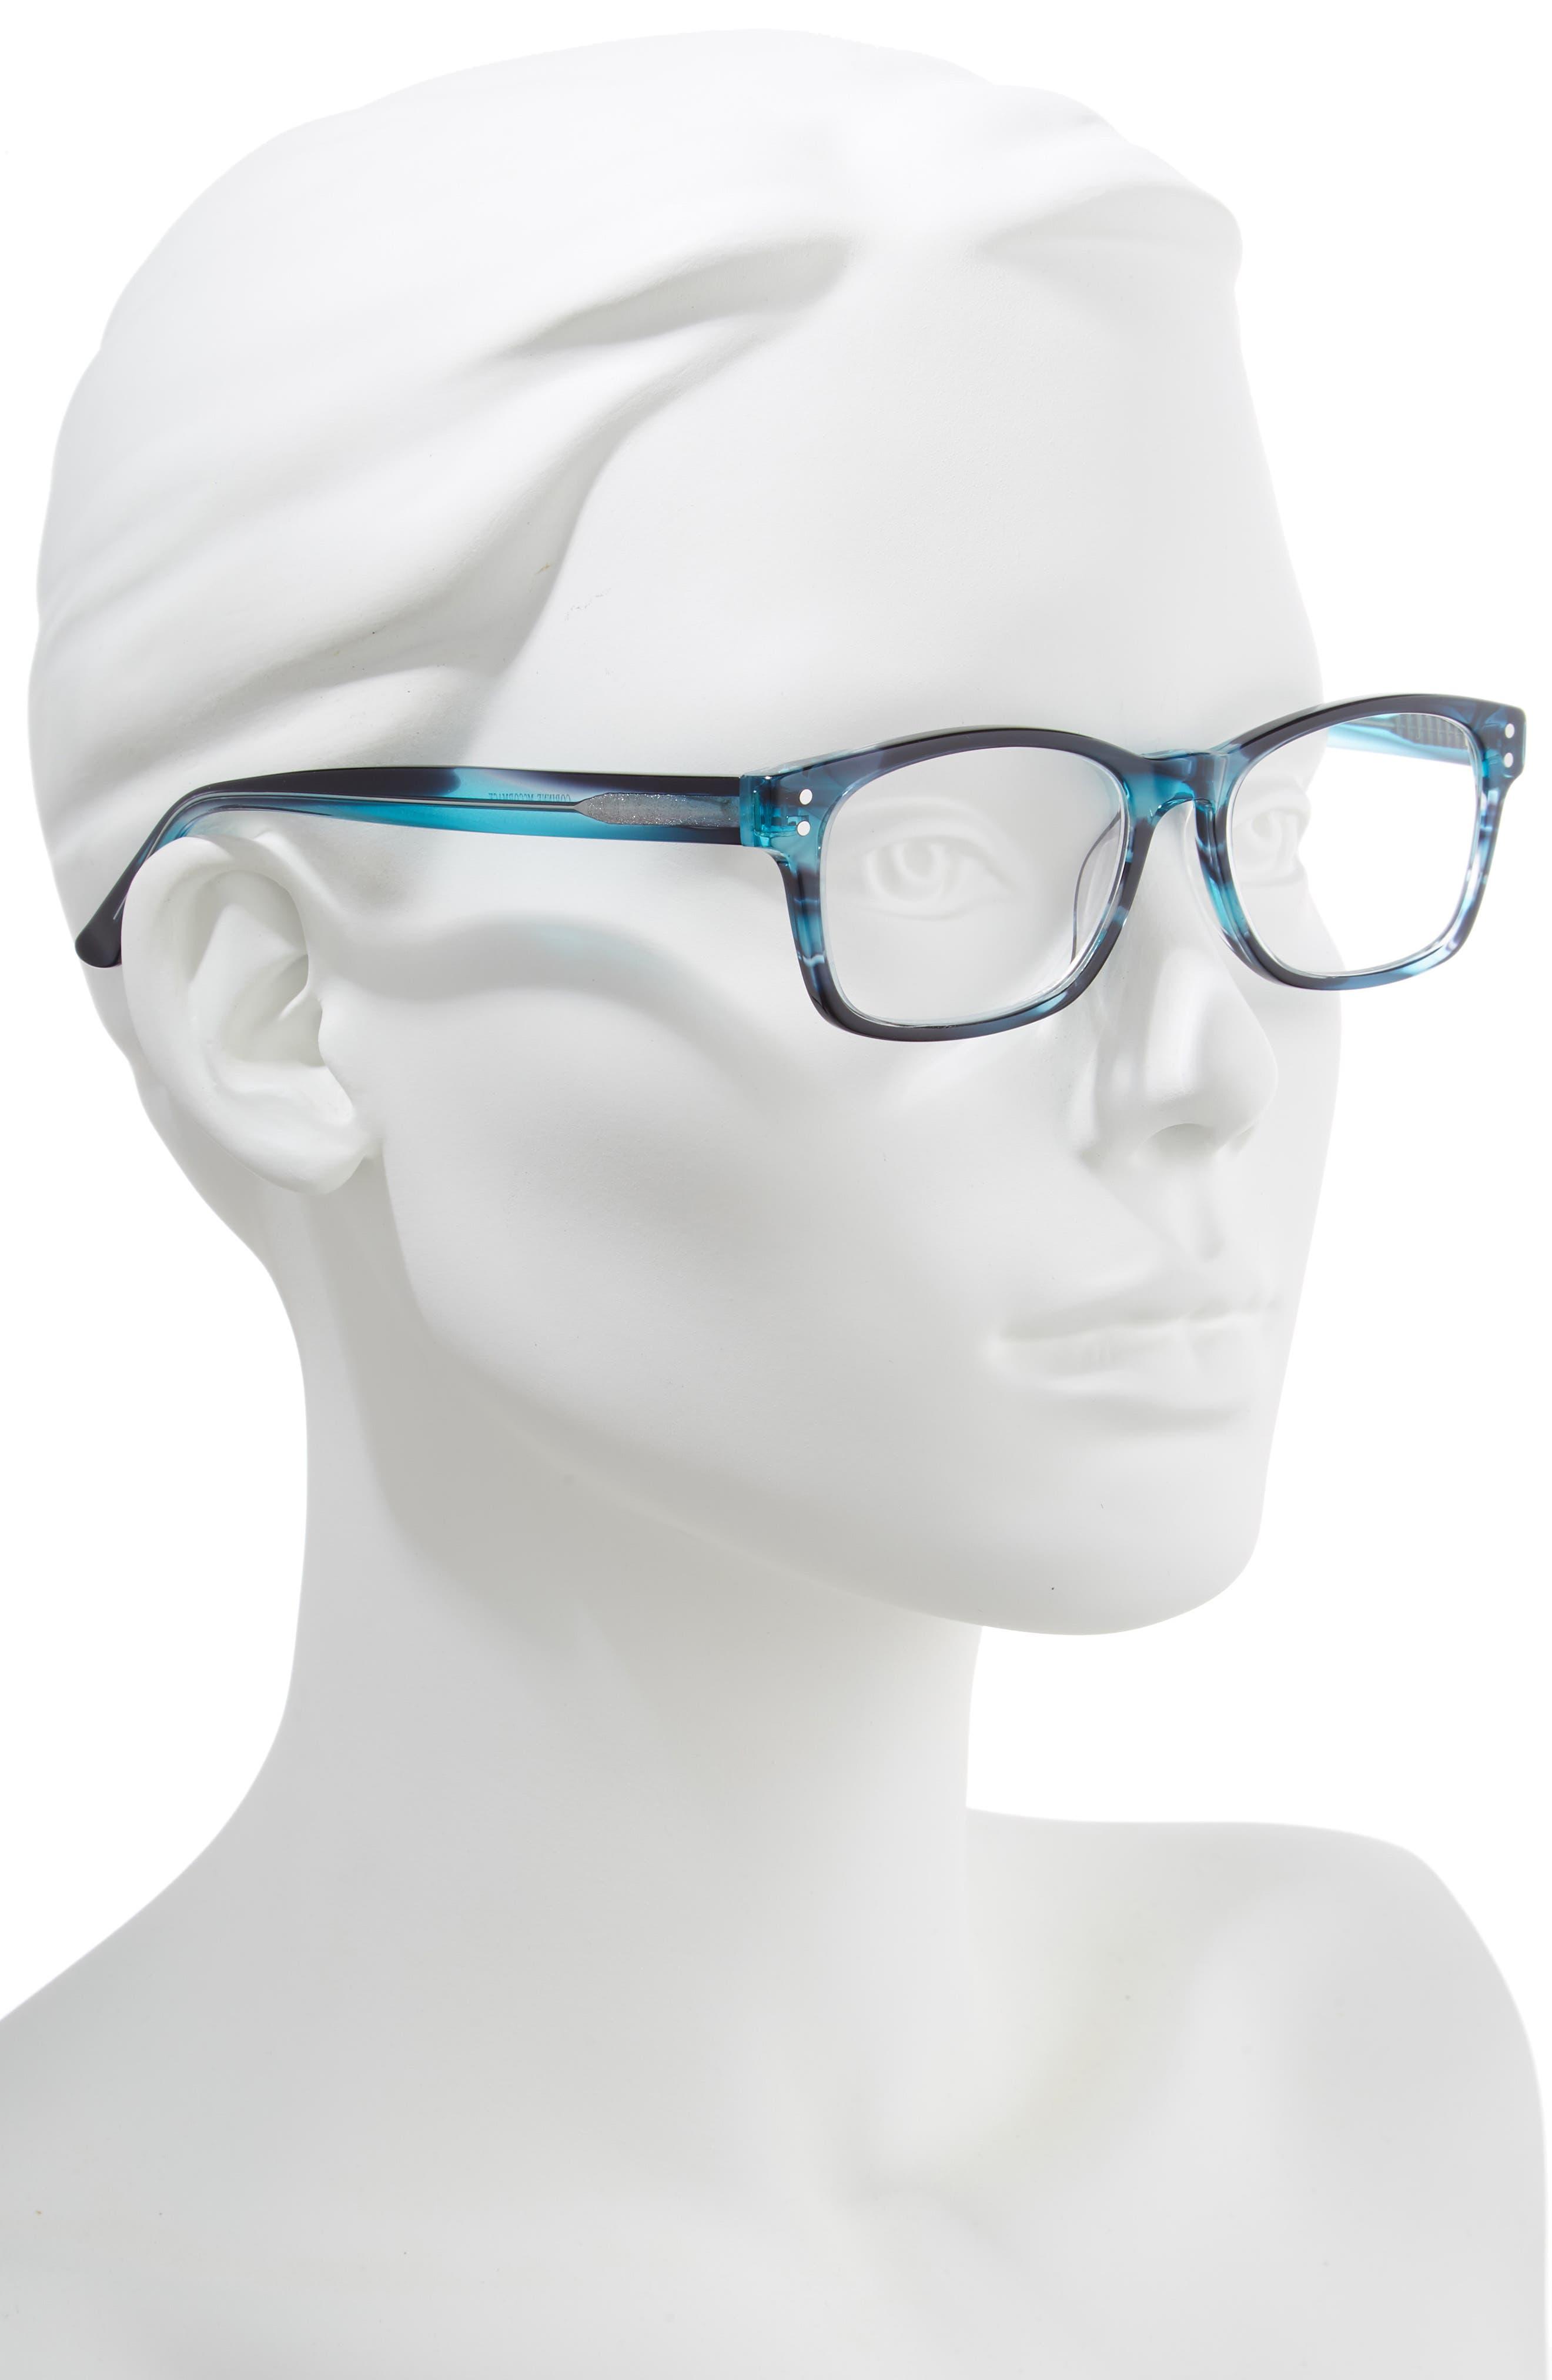 Edie 52mm Reading Glasses,                             Alternate thumbnail 2, color,                             TEAL BLUE